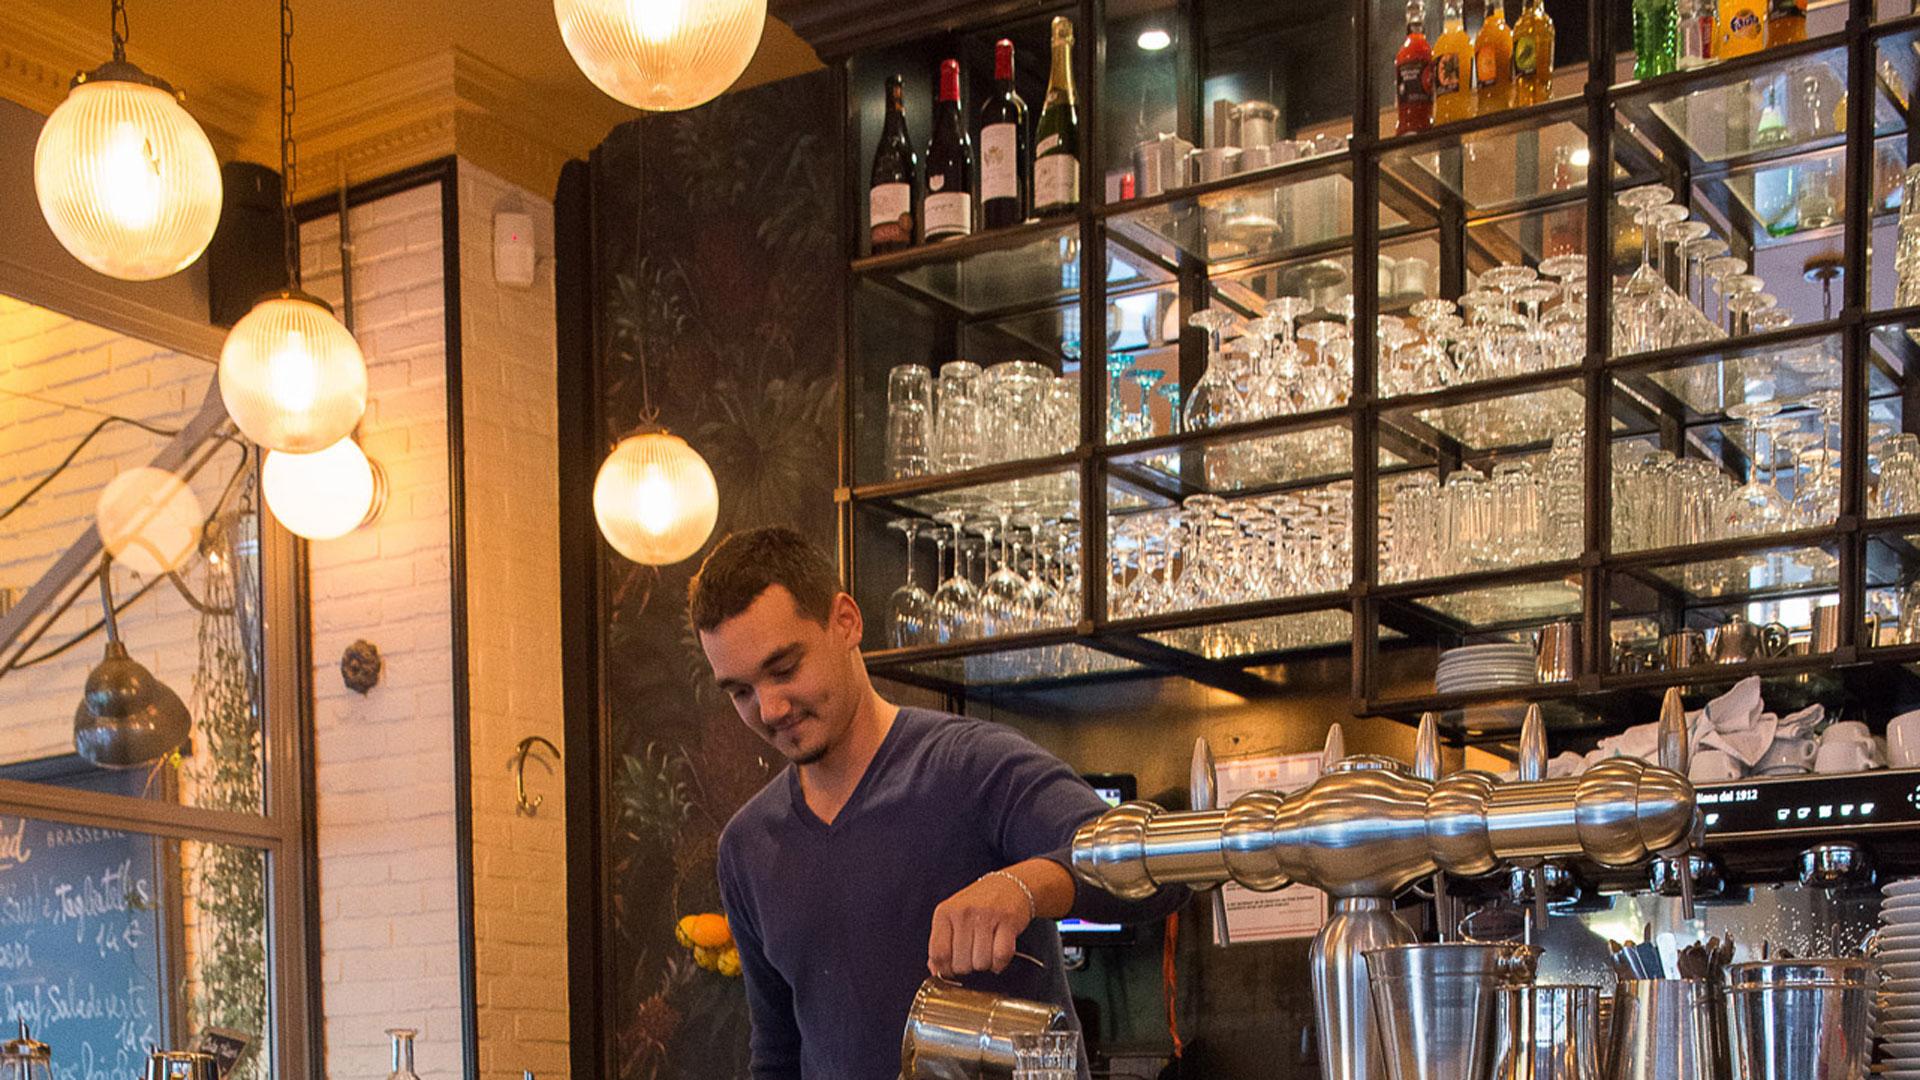 Holophane glass shades help create warm tones in Manfred café, Paris